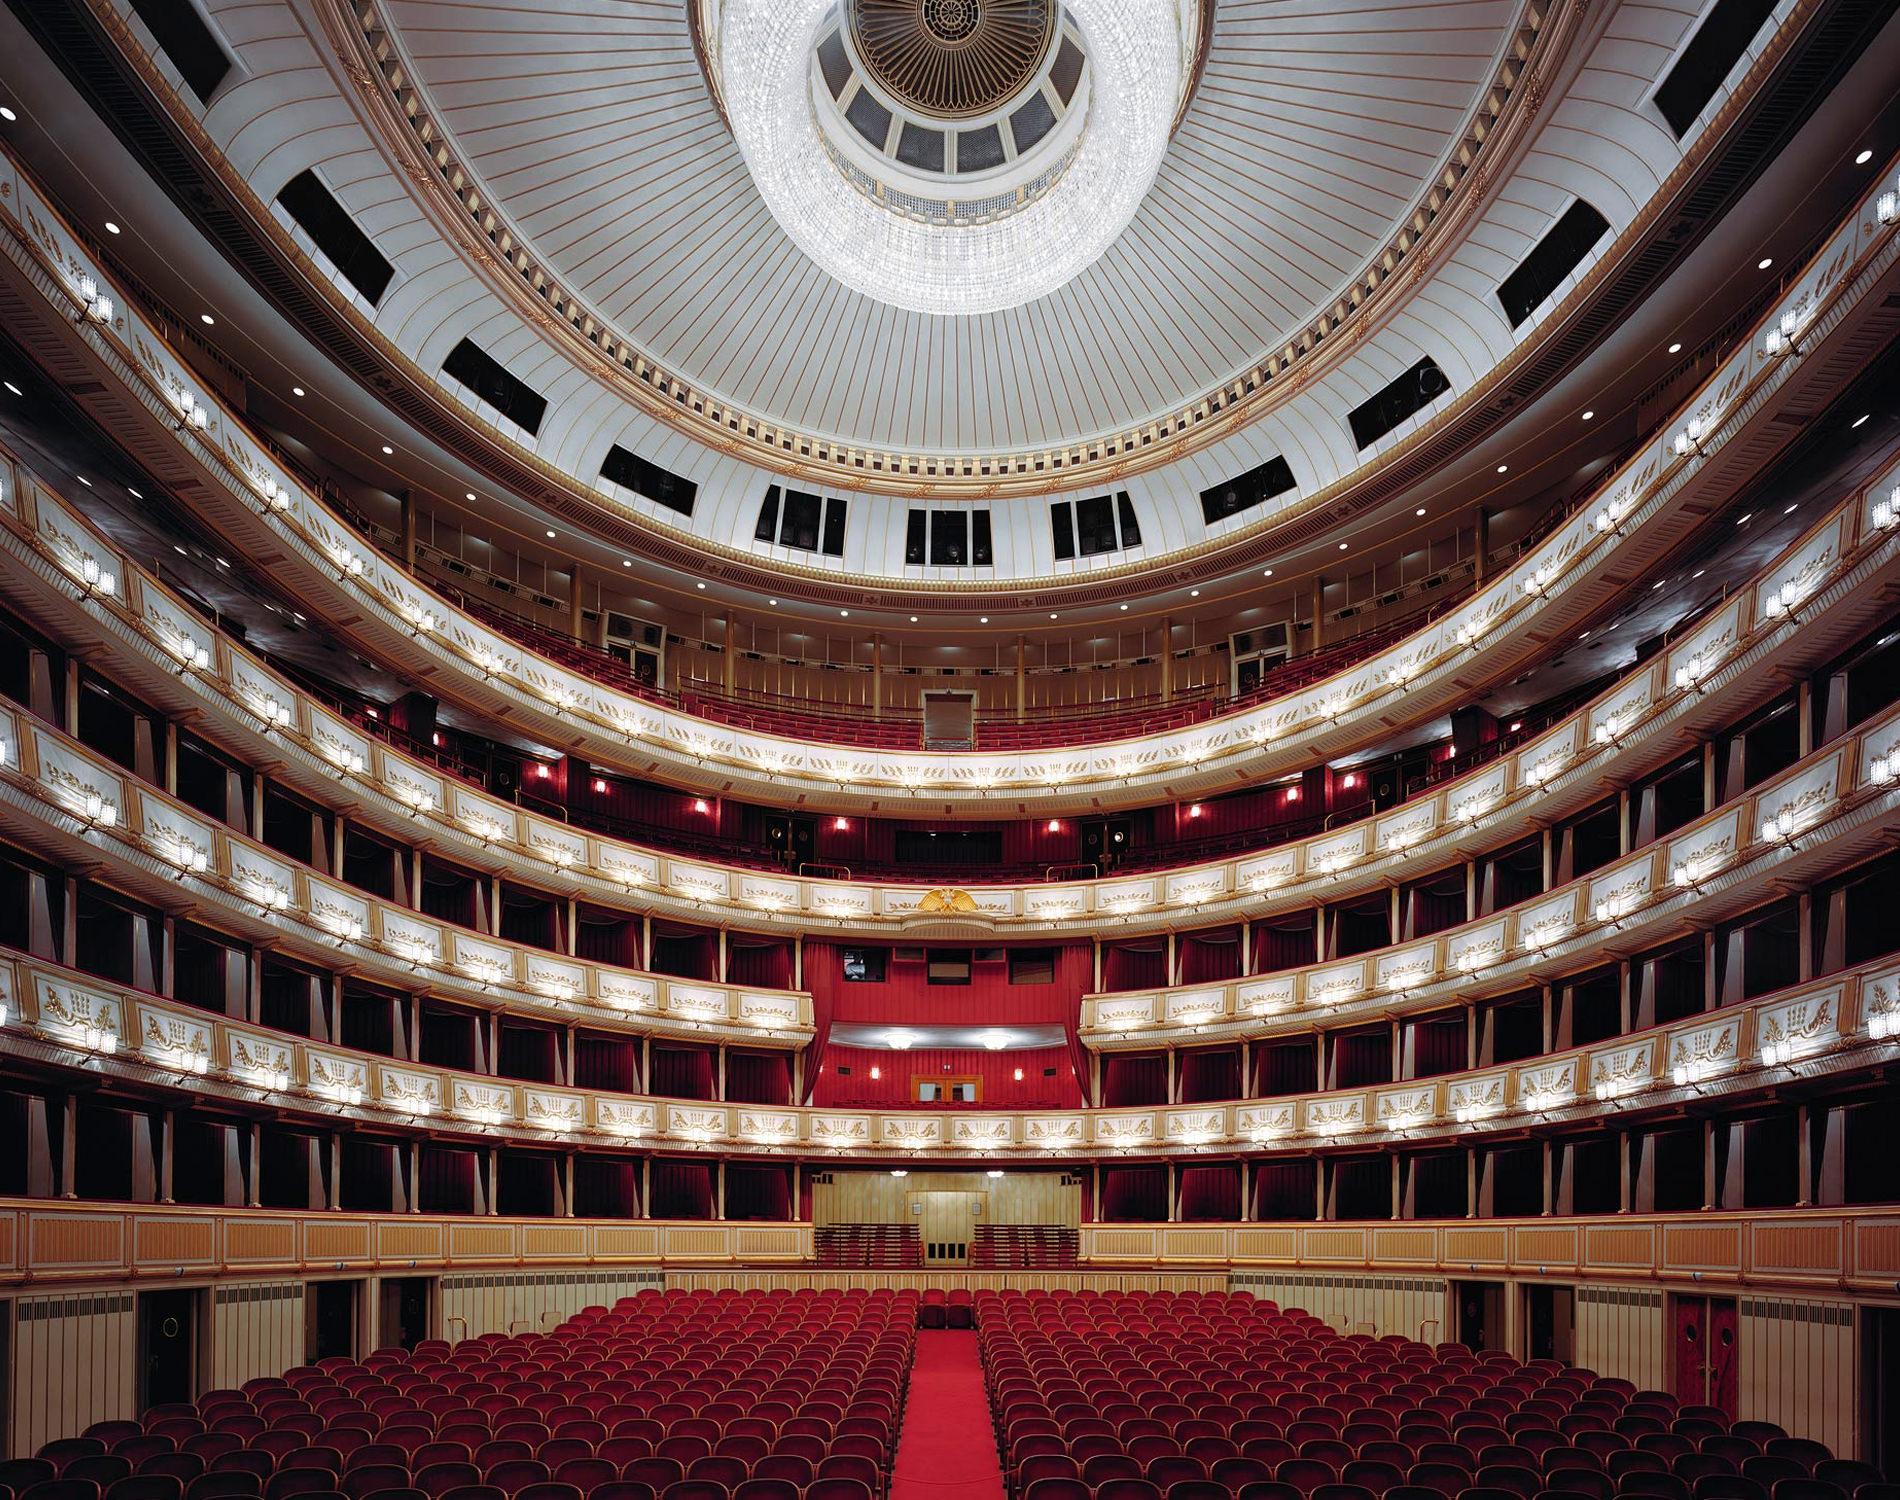 David Leventi Série Photographie Opera Staatsoper Vienne Autriche 2009